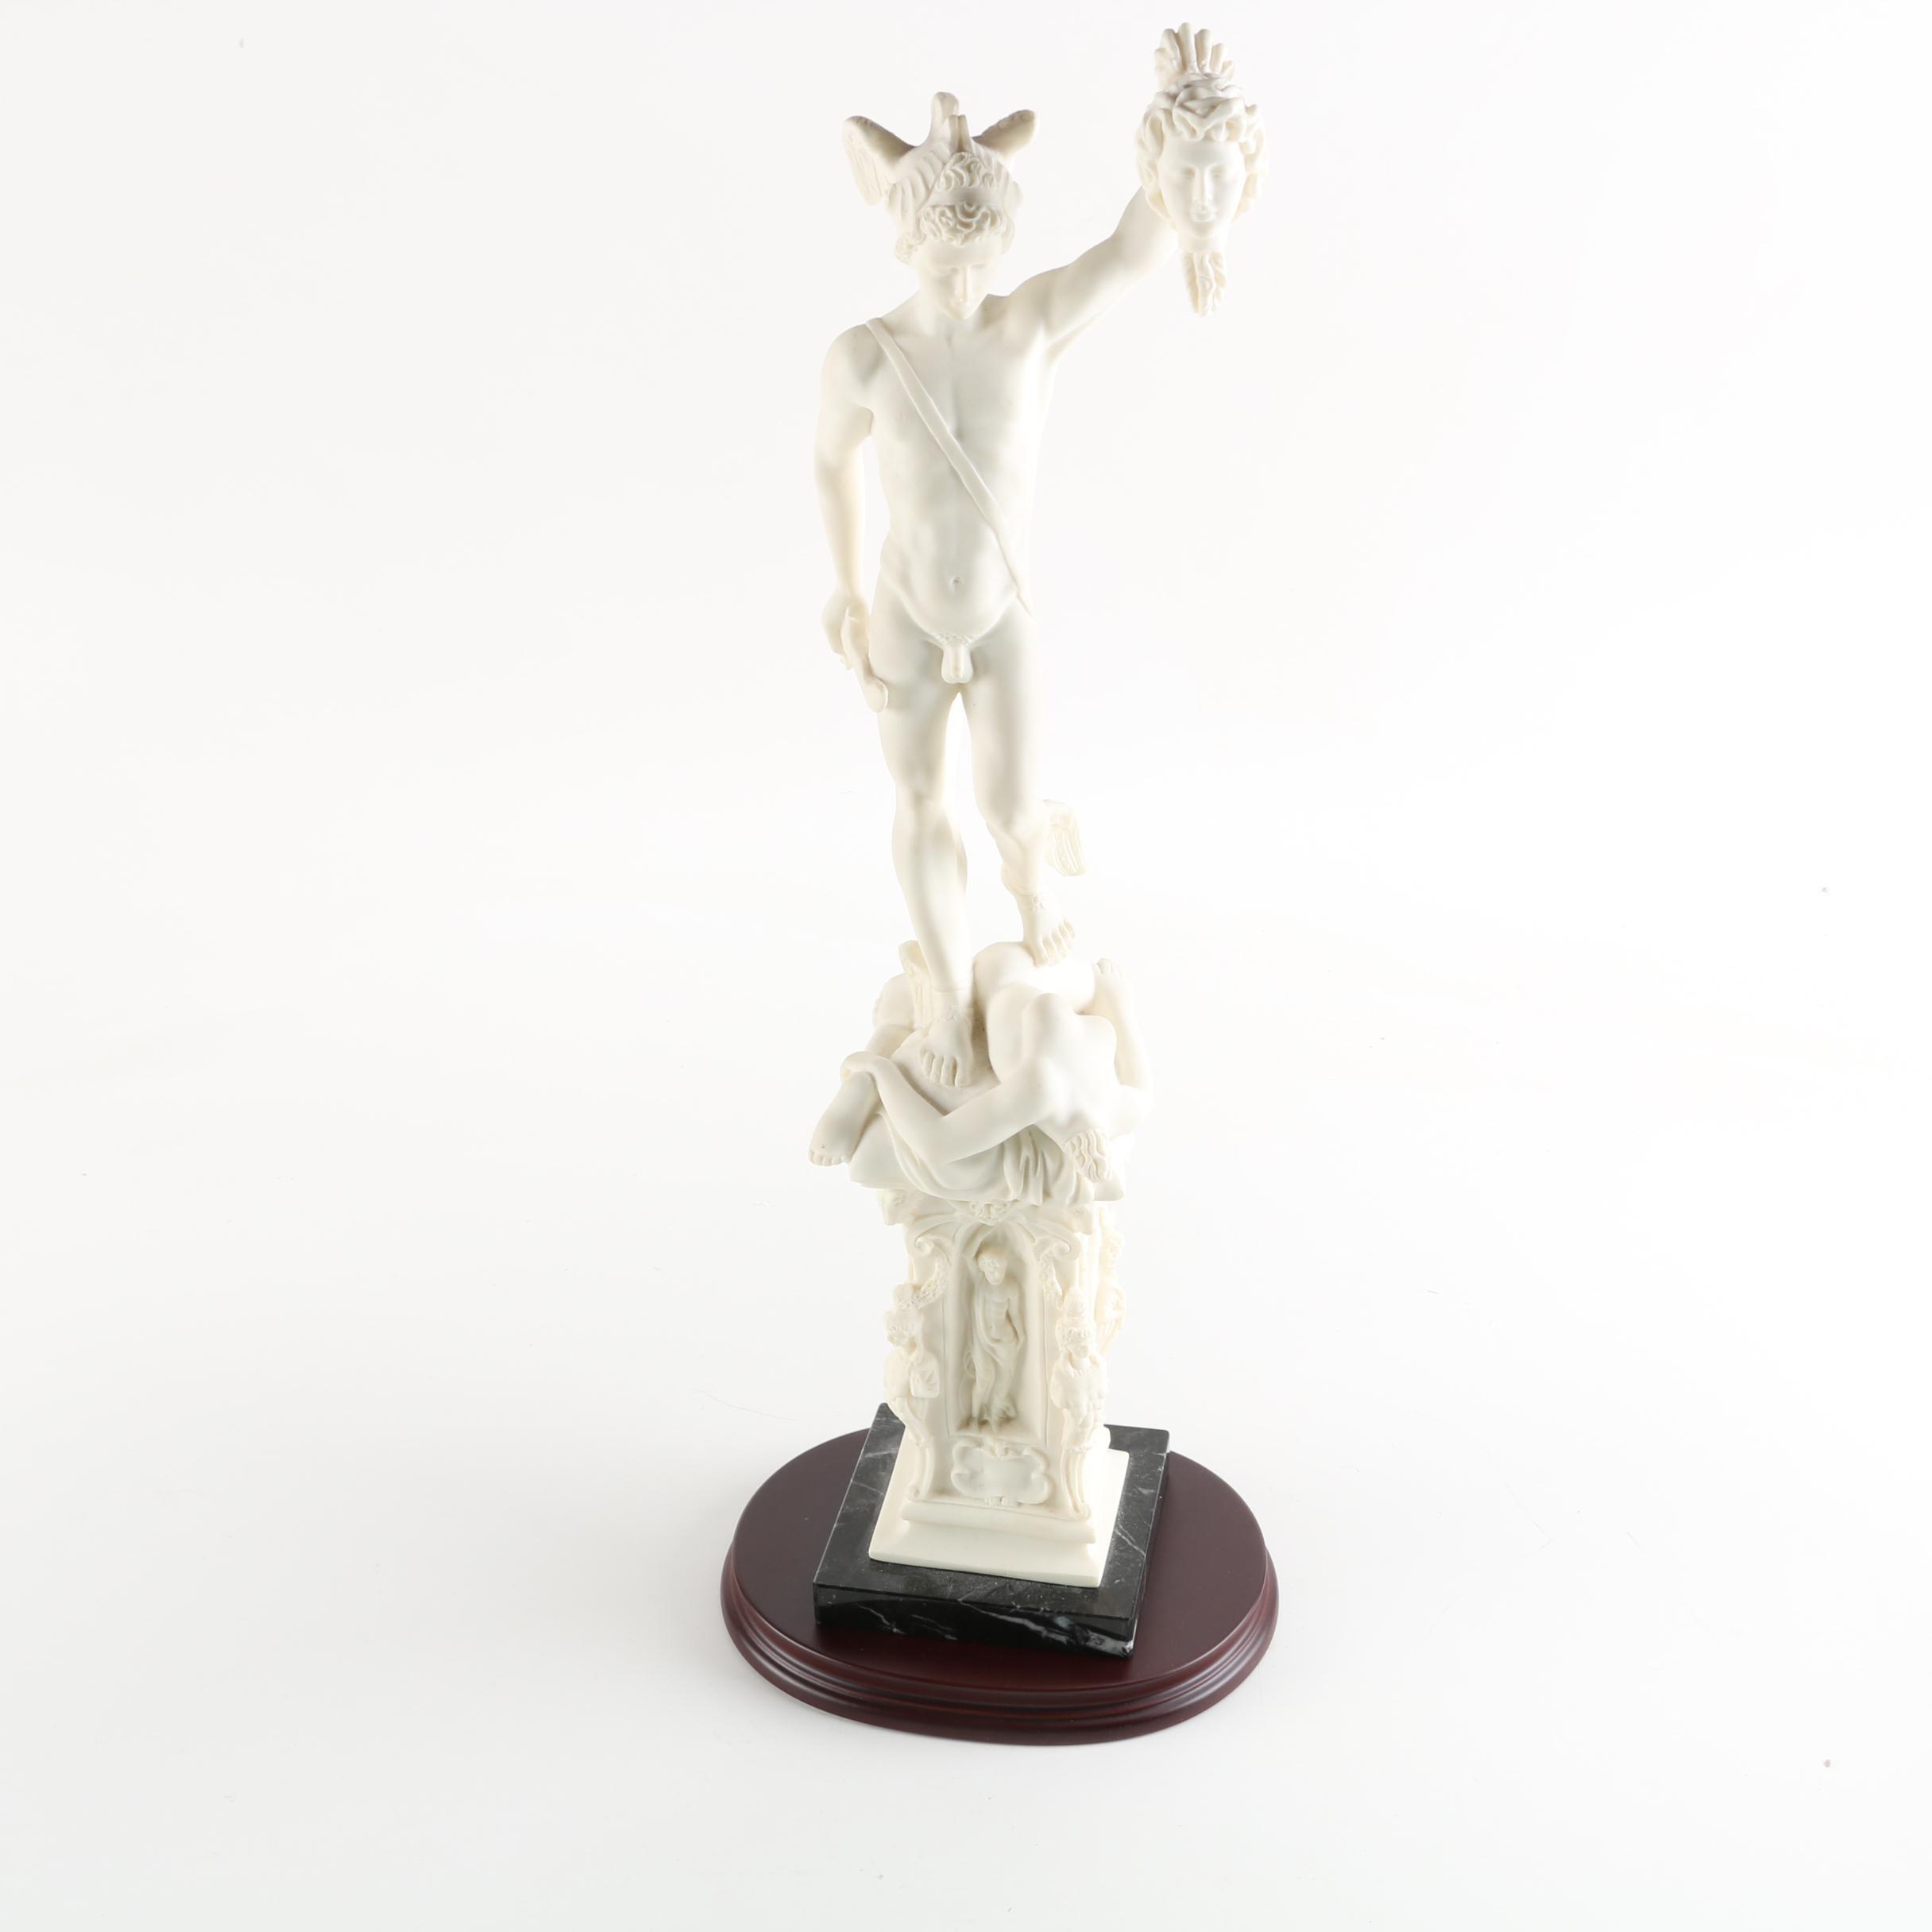 Santini David and Goliath Italian Porcelain Sculpture